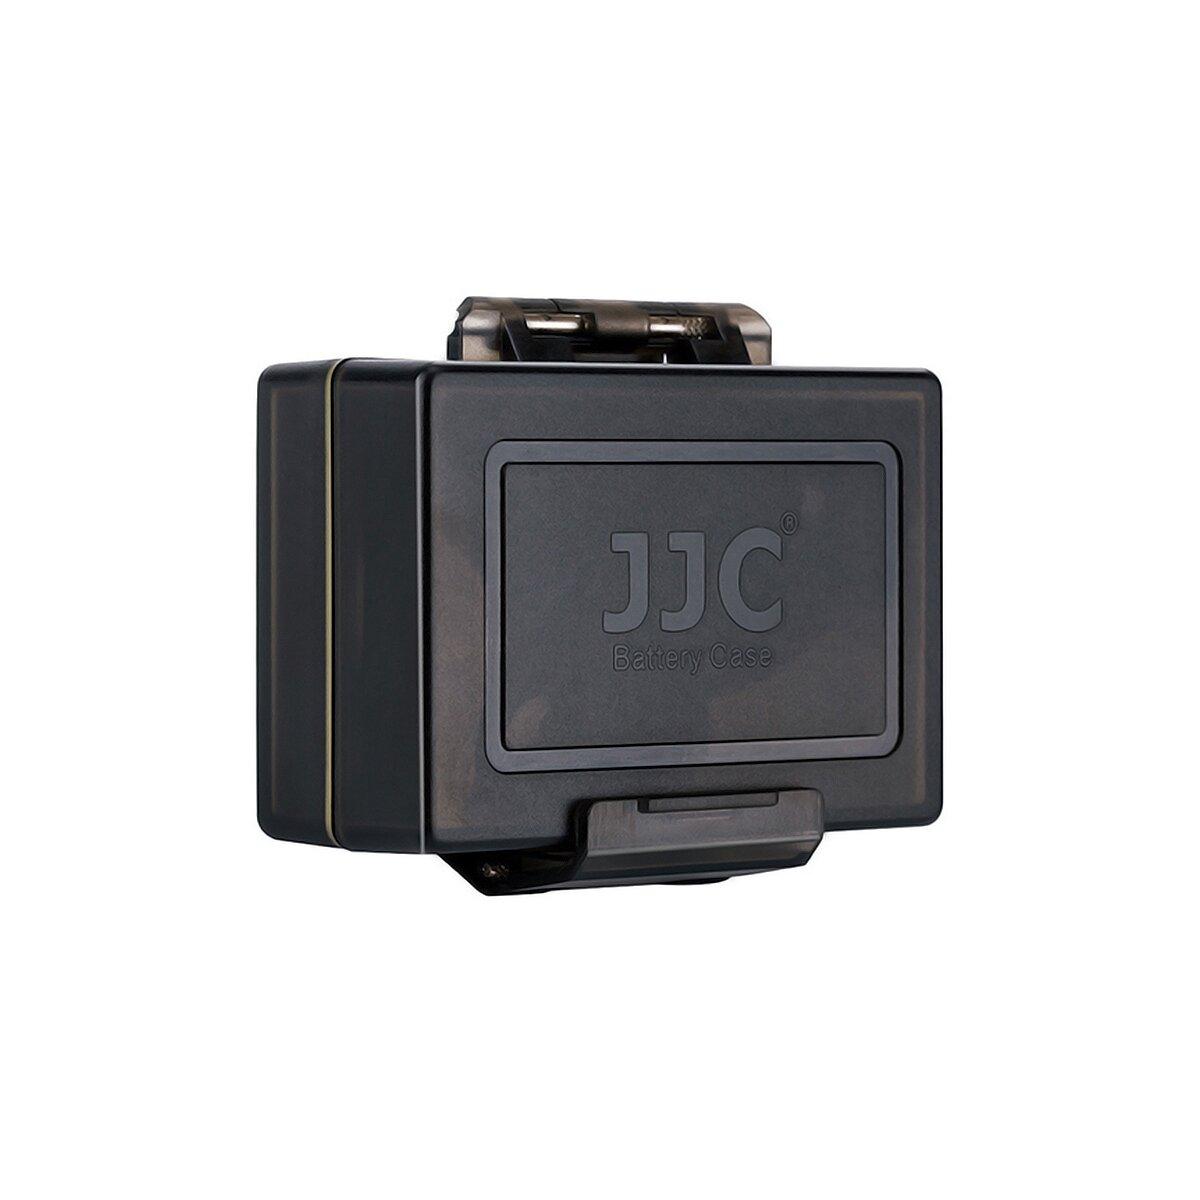 JJC Kamera Akku Schutzbox kompatibel mit Canon LP-E6 LP-E6N mit Speicherkartenetui 1x SD-Karte und 2x Micro SD-Karte